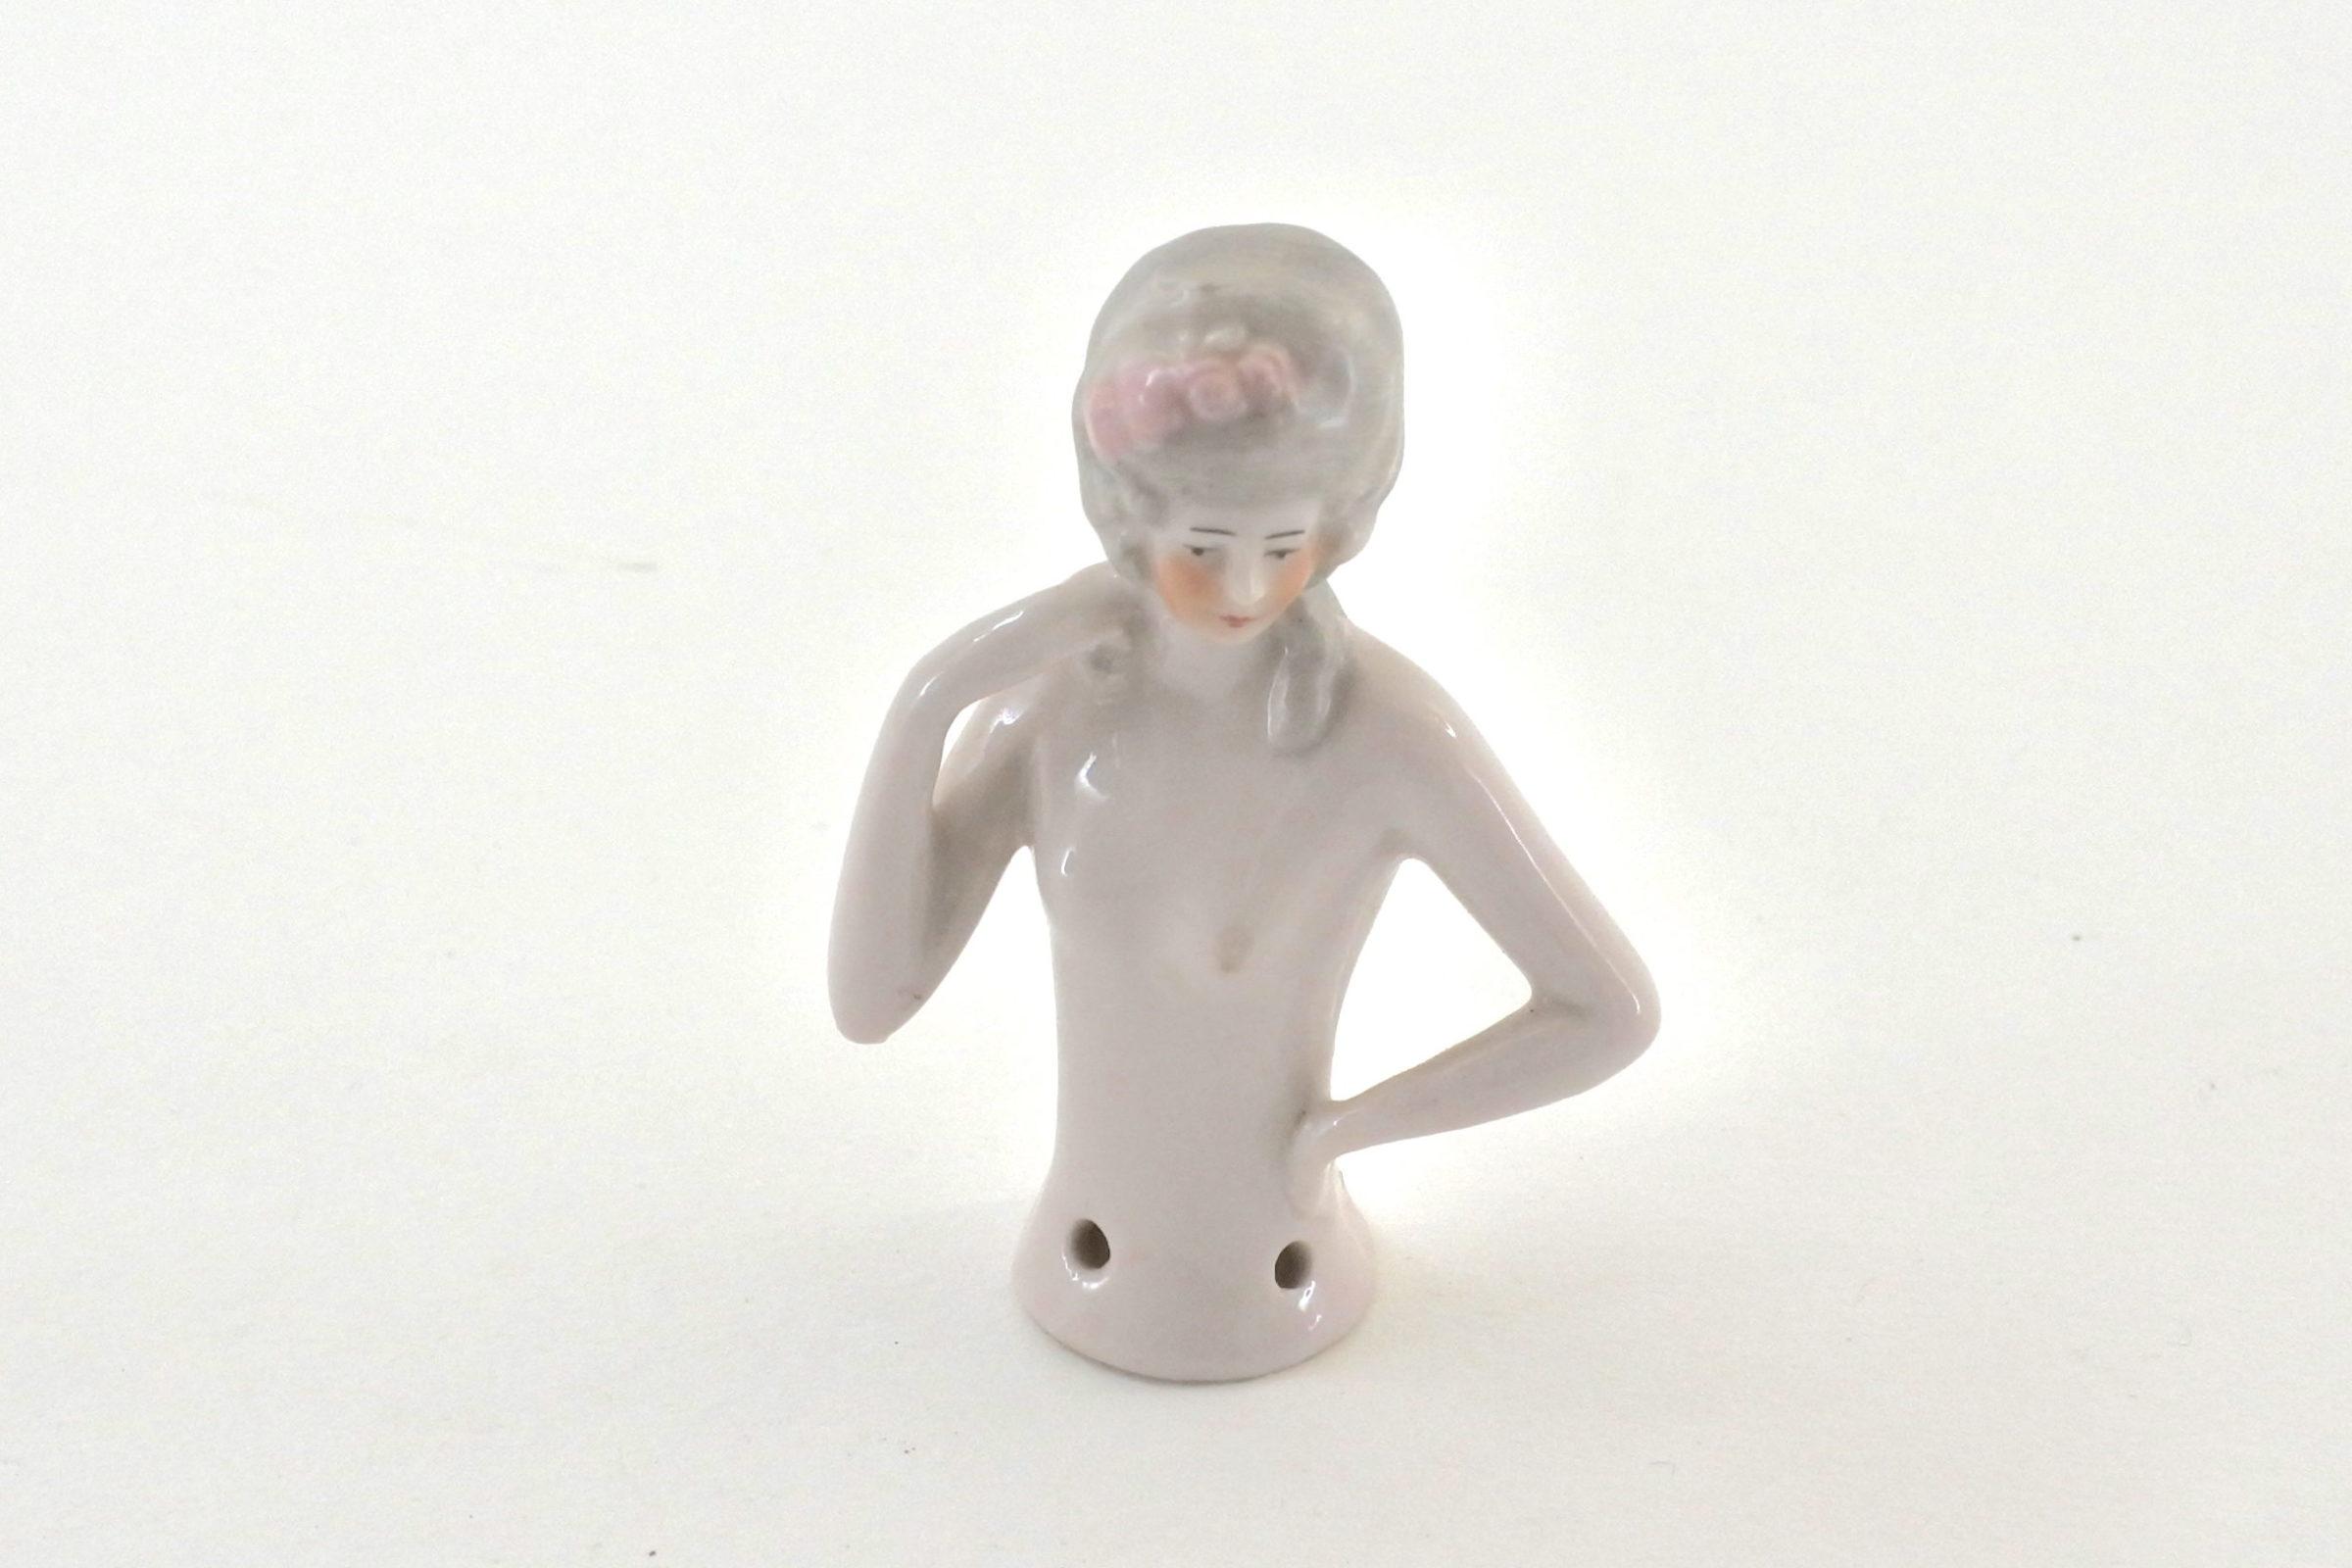 Demi poupée in ceramica - Altezza 6,6 cm